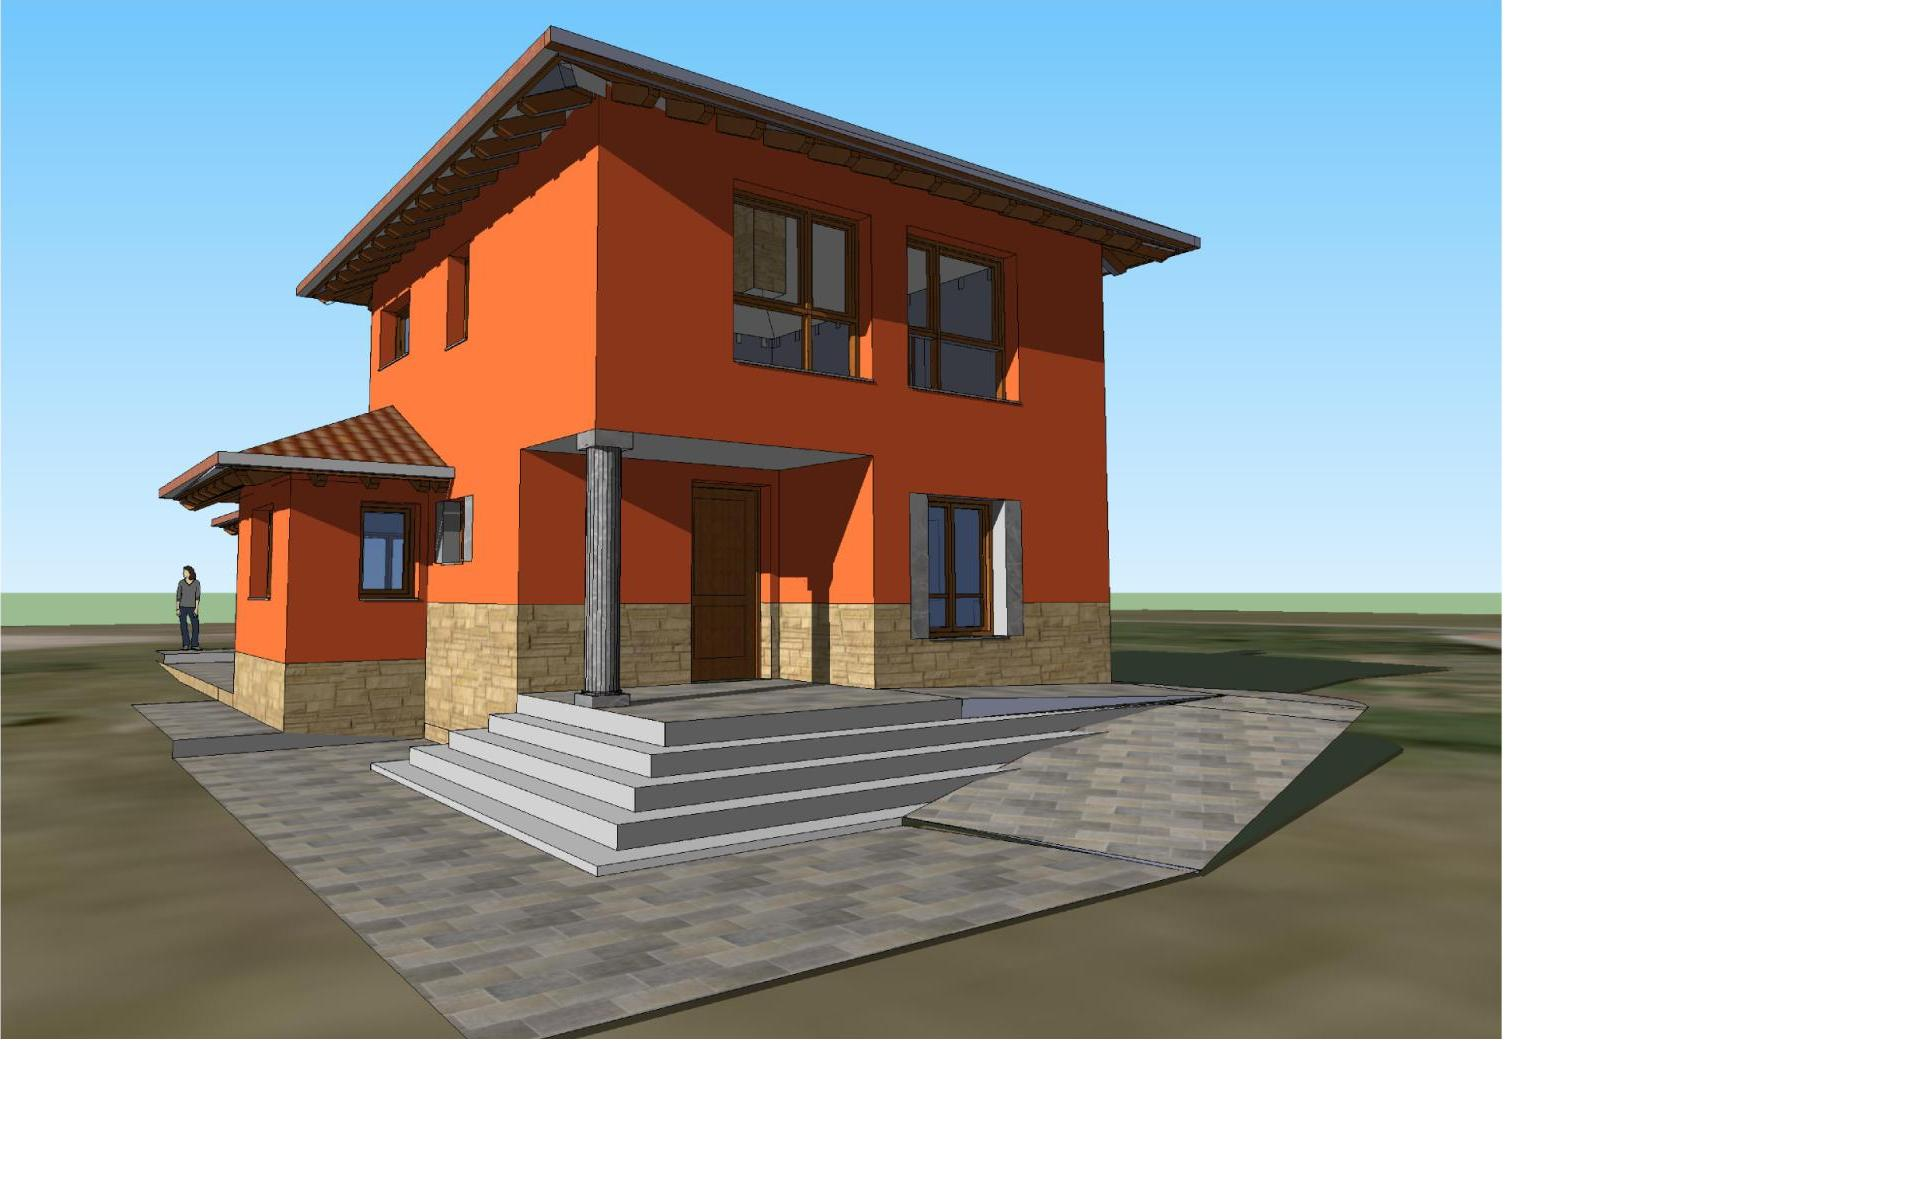 Arquitecto en cudillero asturias vista exterior 2 - Arquitectos asturias ...